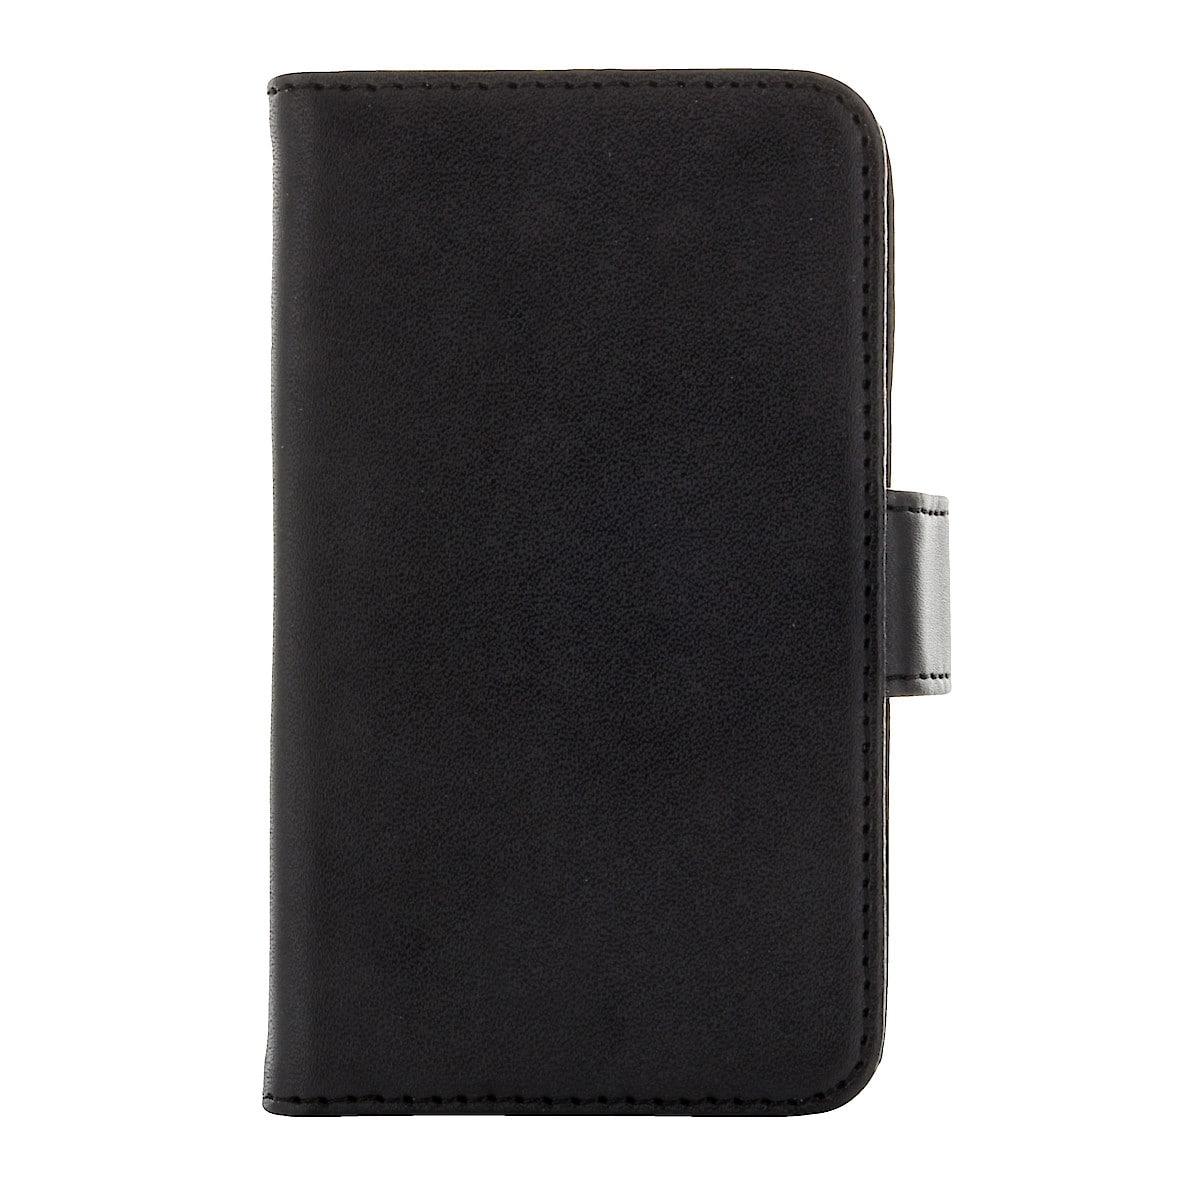 Plånboksfodral XL för iPhone 4/4S, Holdit